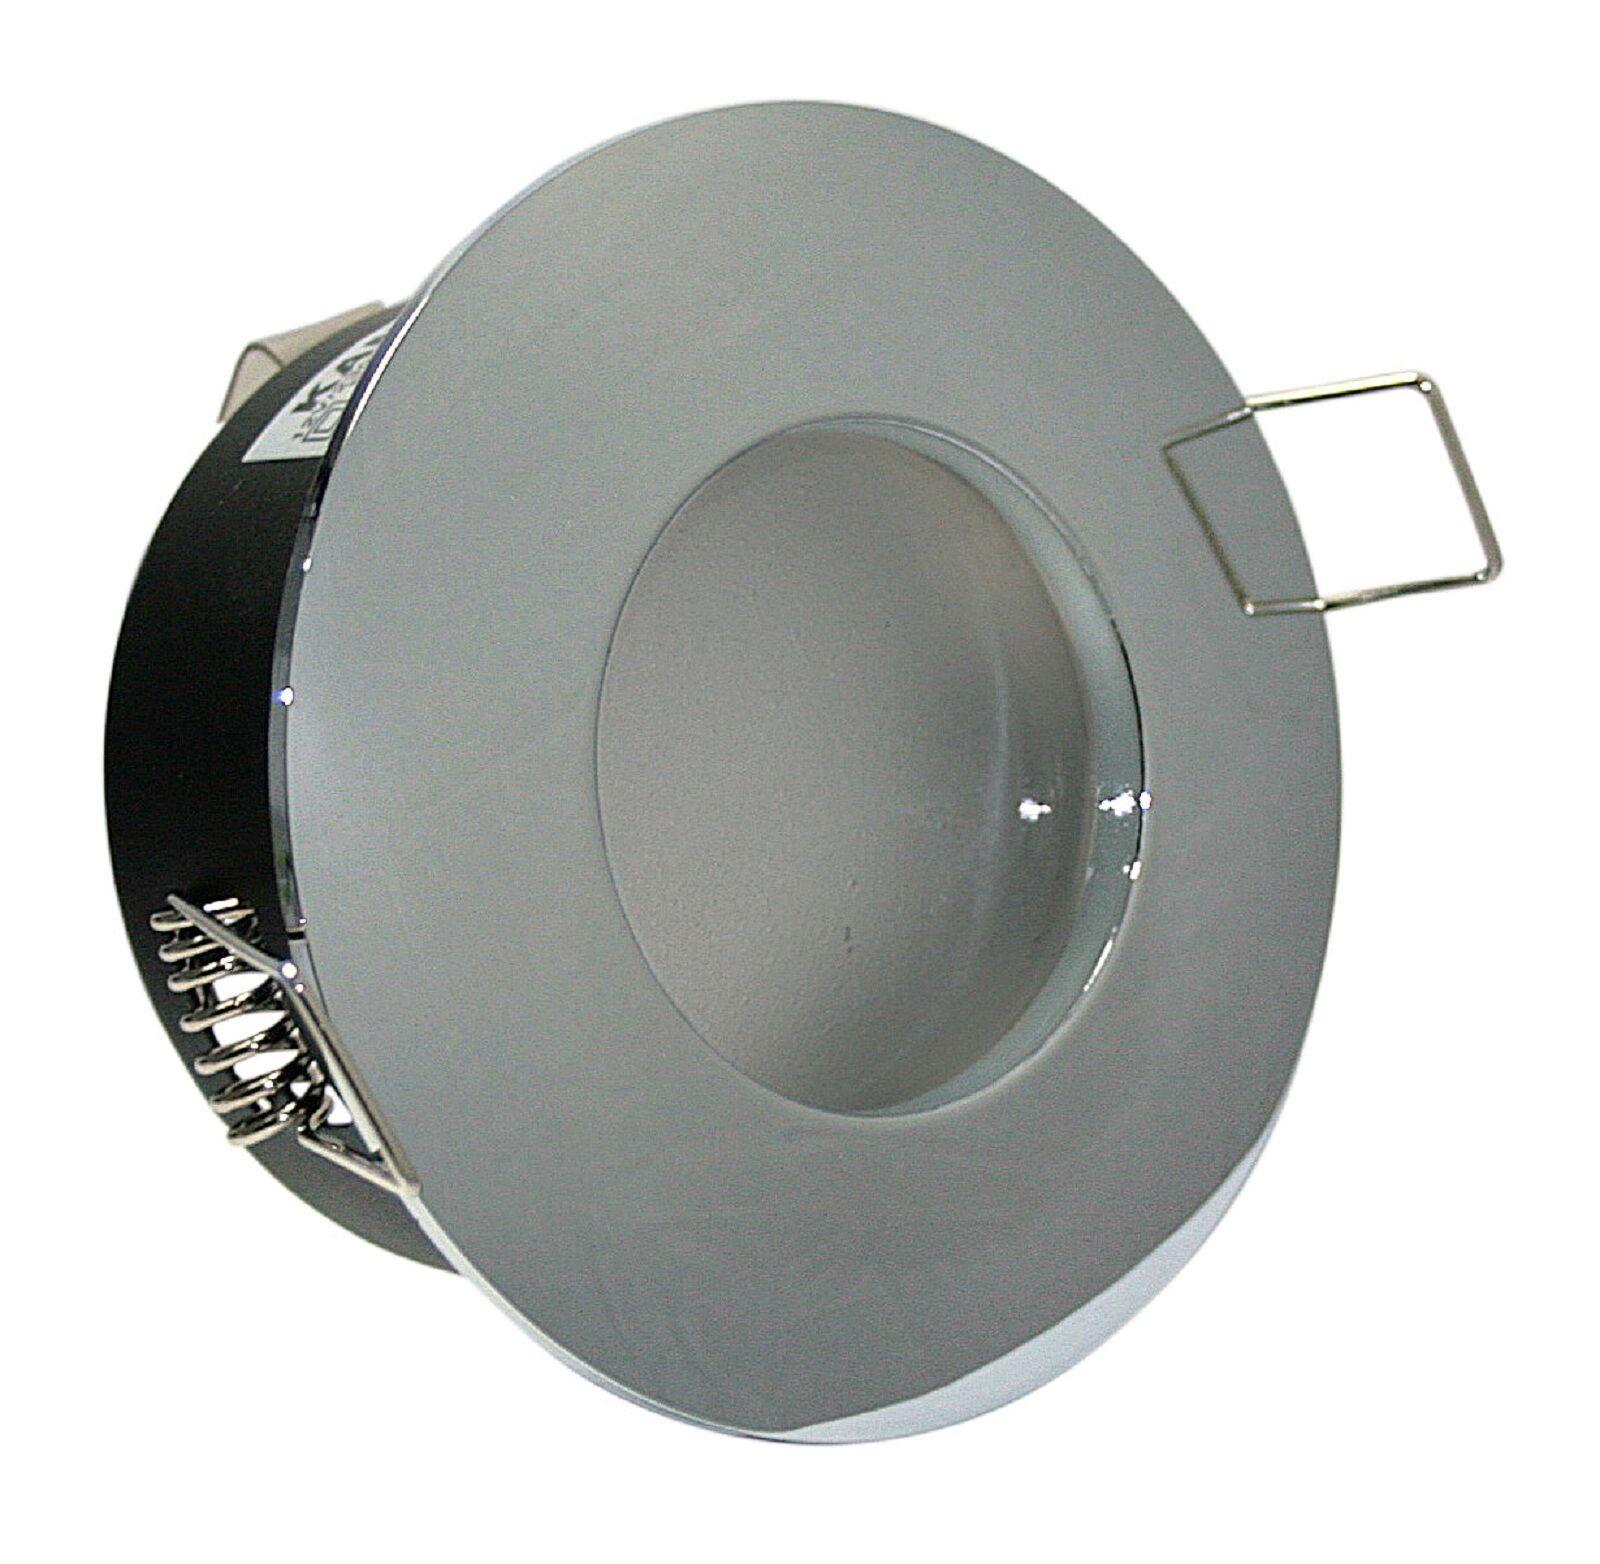 230V 7W = 52W LED Dusche Einbauspot Aqua IP65 inkl Leuchtmittel rostfrei GU10 A+